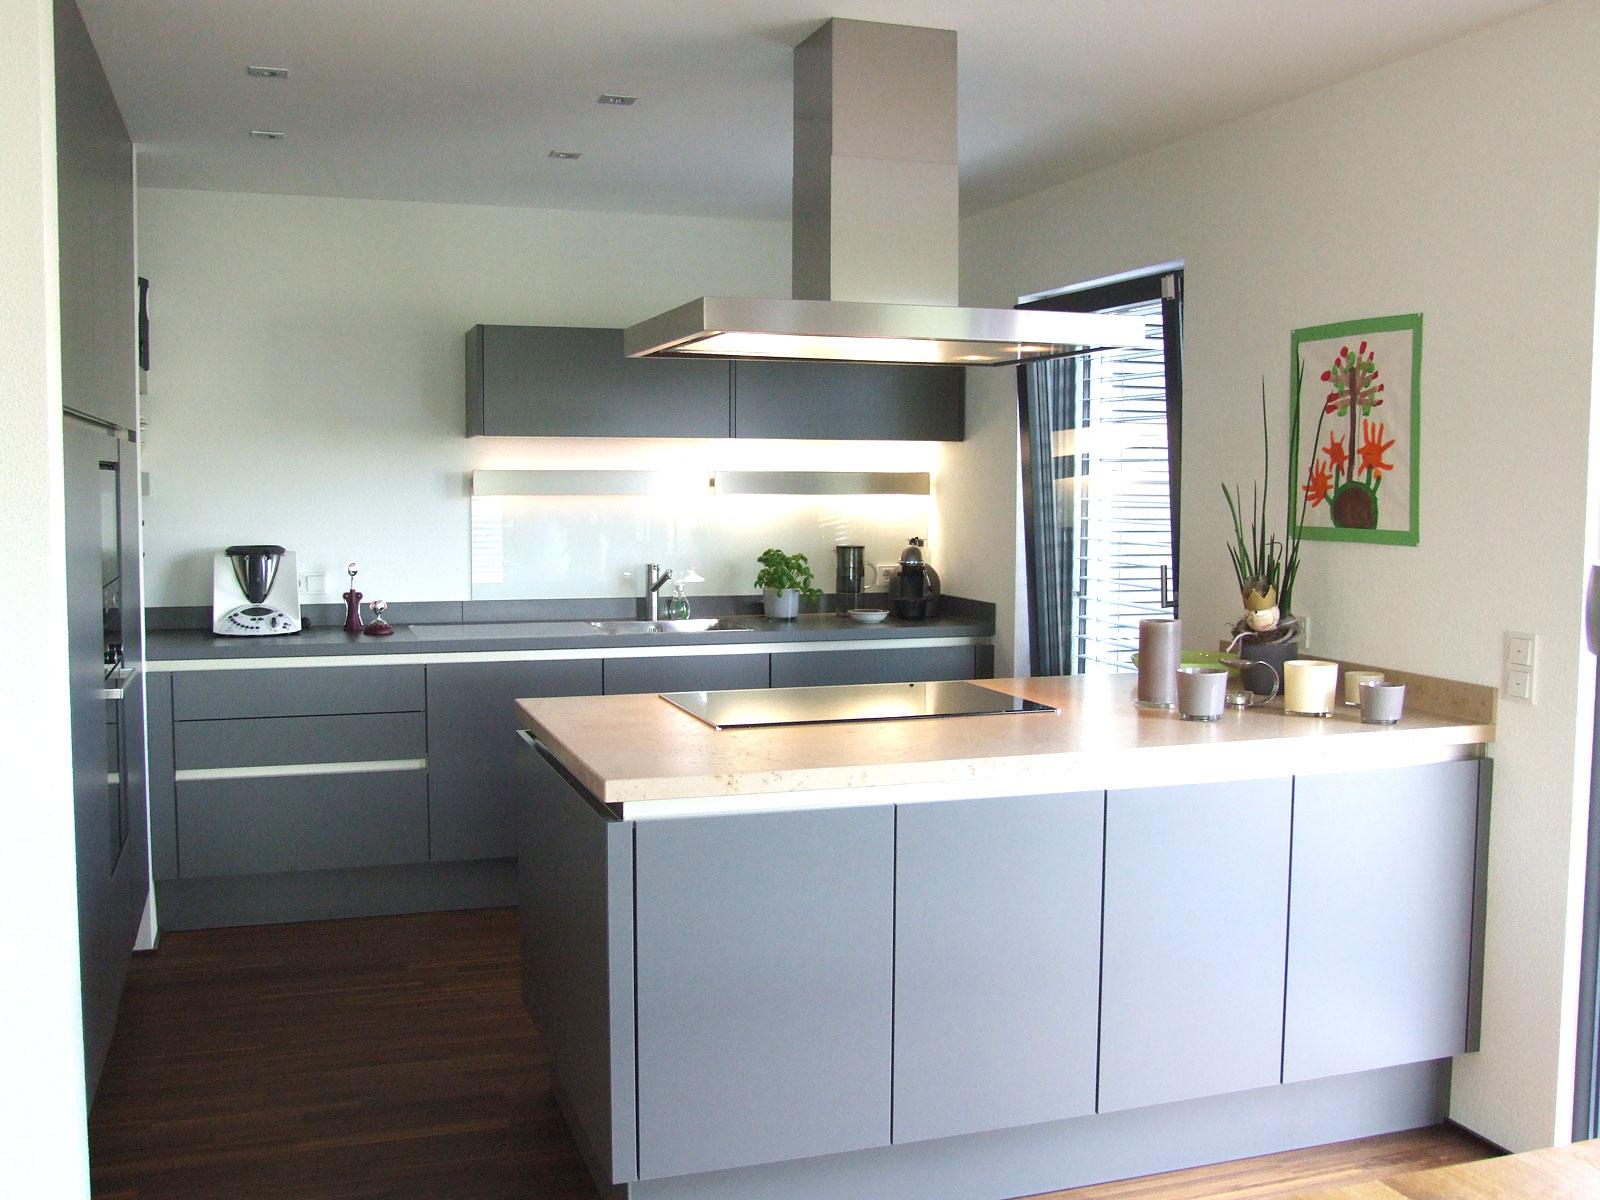 Full Size of Küchen Ideen Regal Bad Renovieren Wohnzimmer Tapeten Wohnzimmer Küchen Ideen